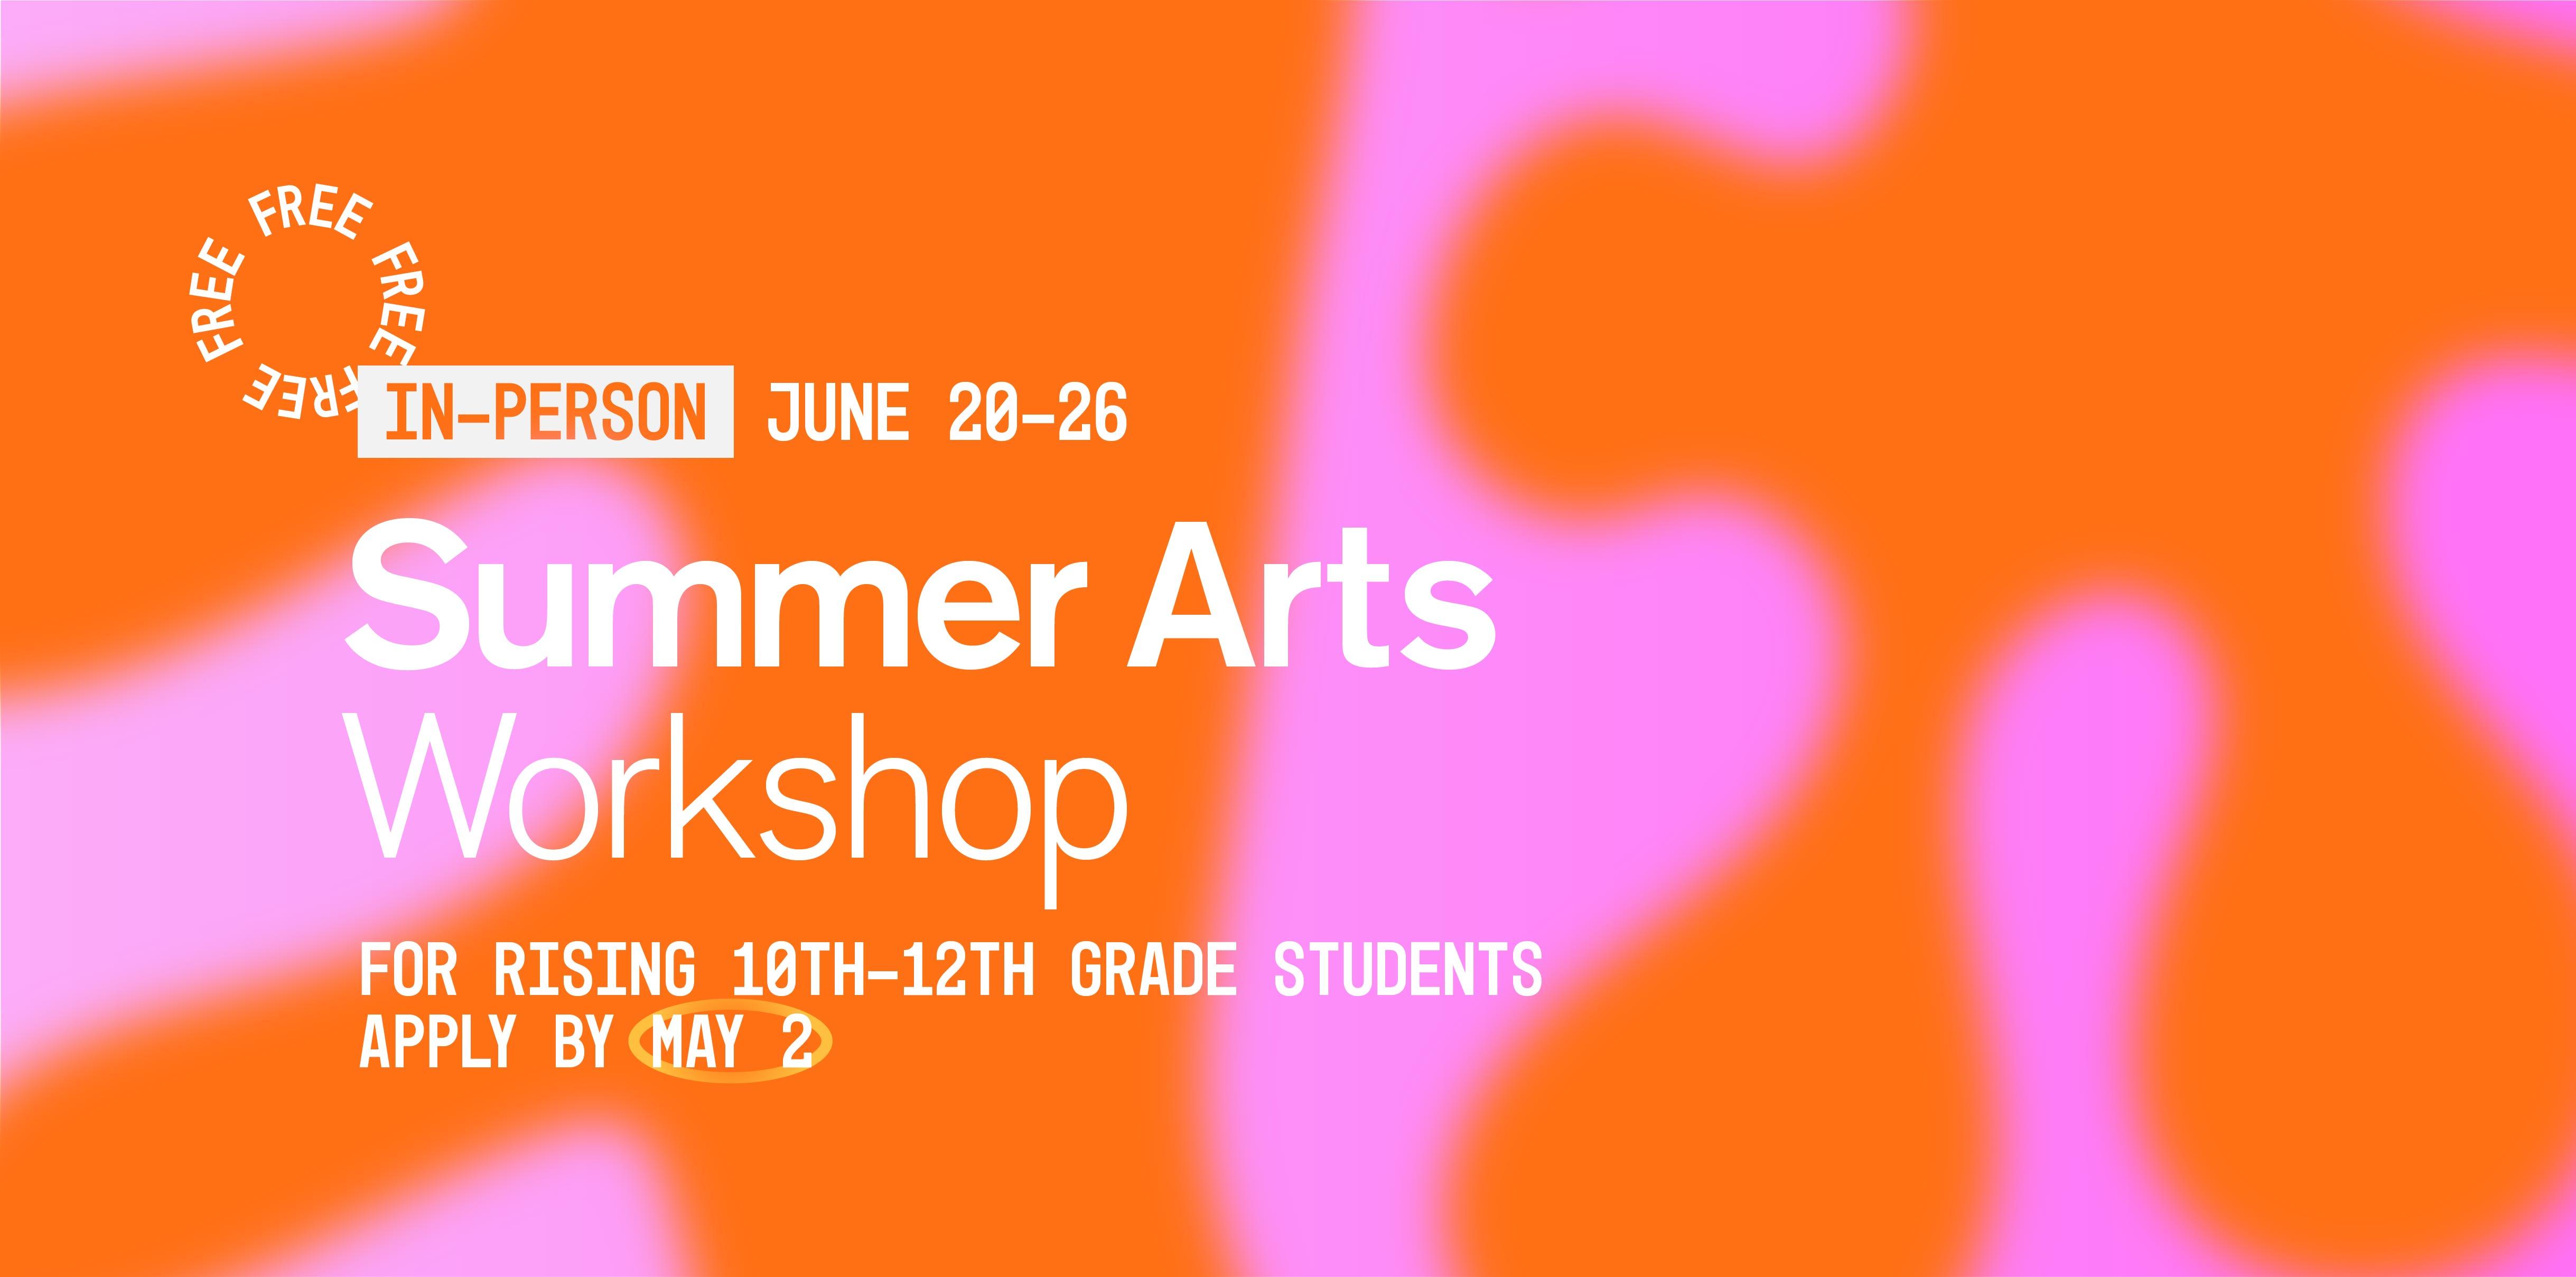 UA School of Art Summer Arts Workshop Application (In-Person)